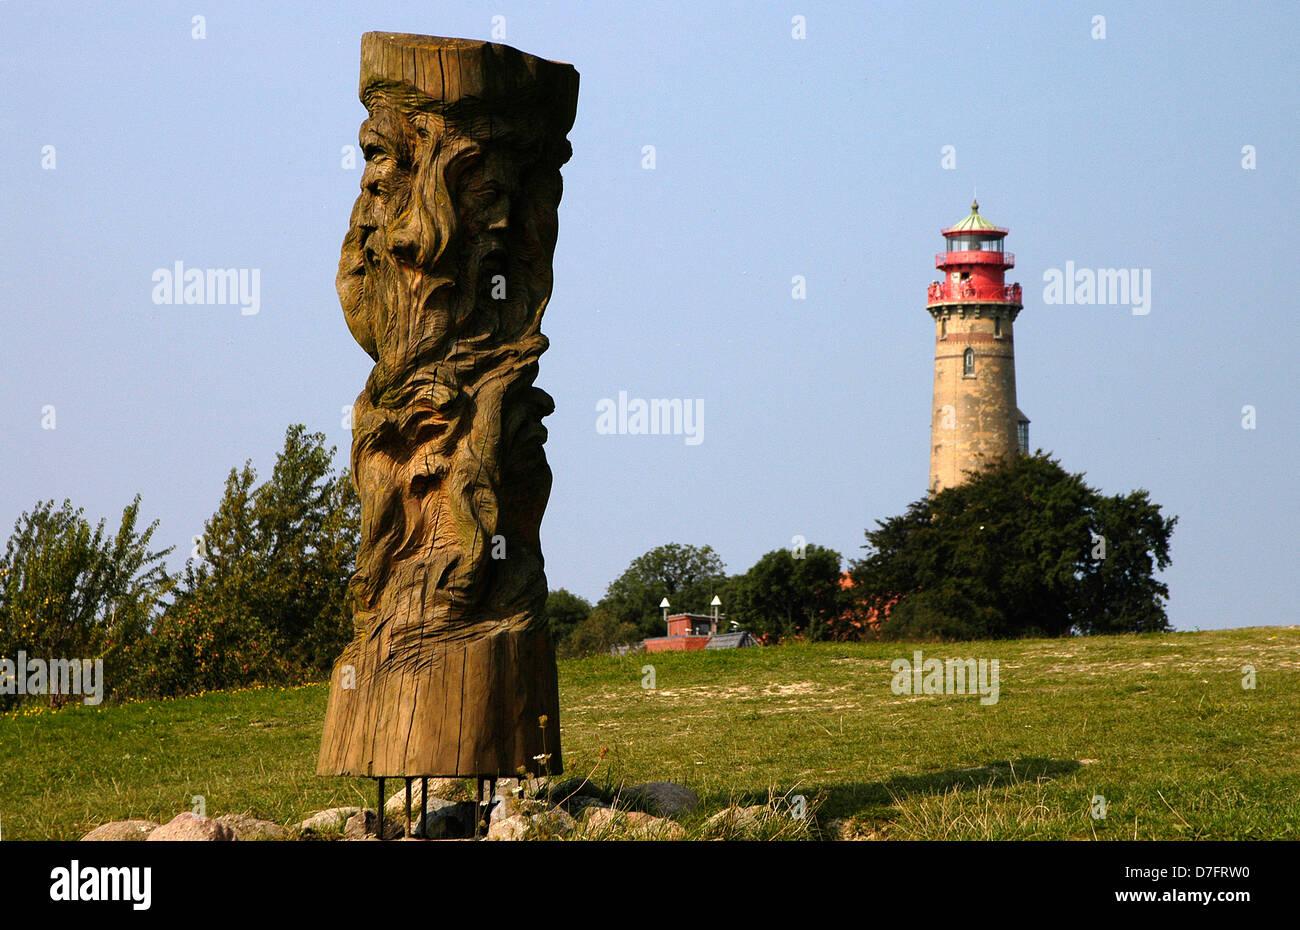 Germany, Baltic Sea, Rügen, Ruegen, cape Arkona, lighthouse - Stock Image